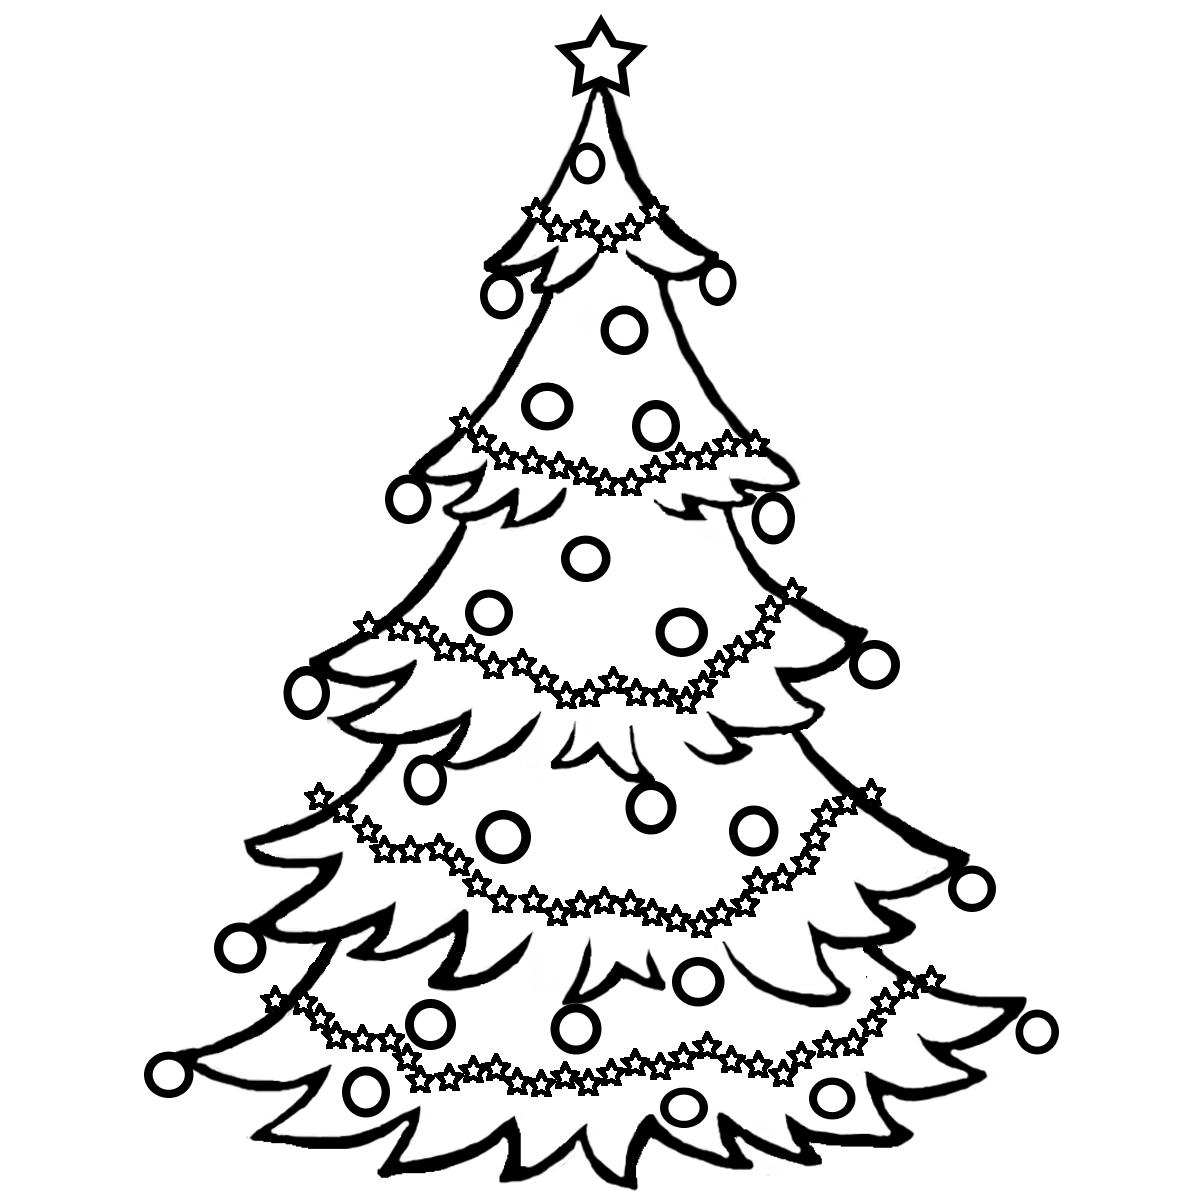 Free Christmas Tree Clip Art Borders | Clipart Panda ...